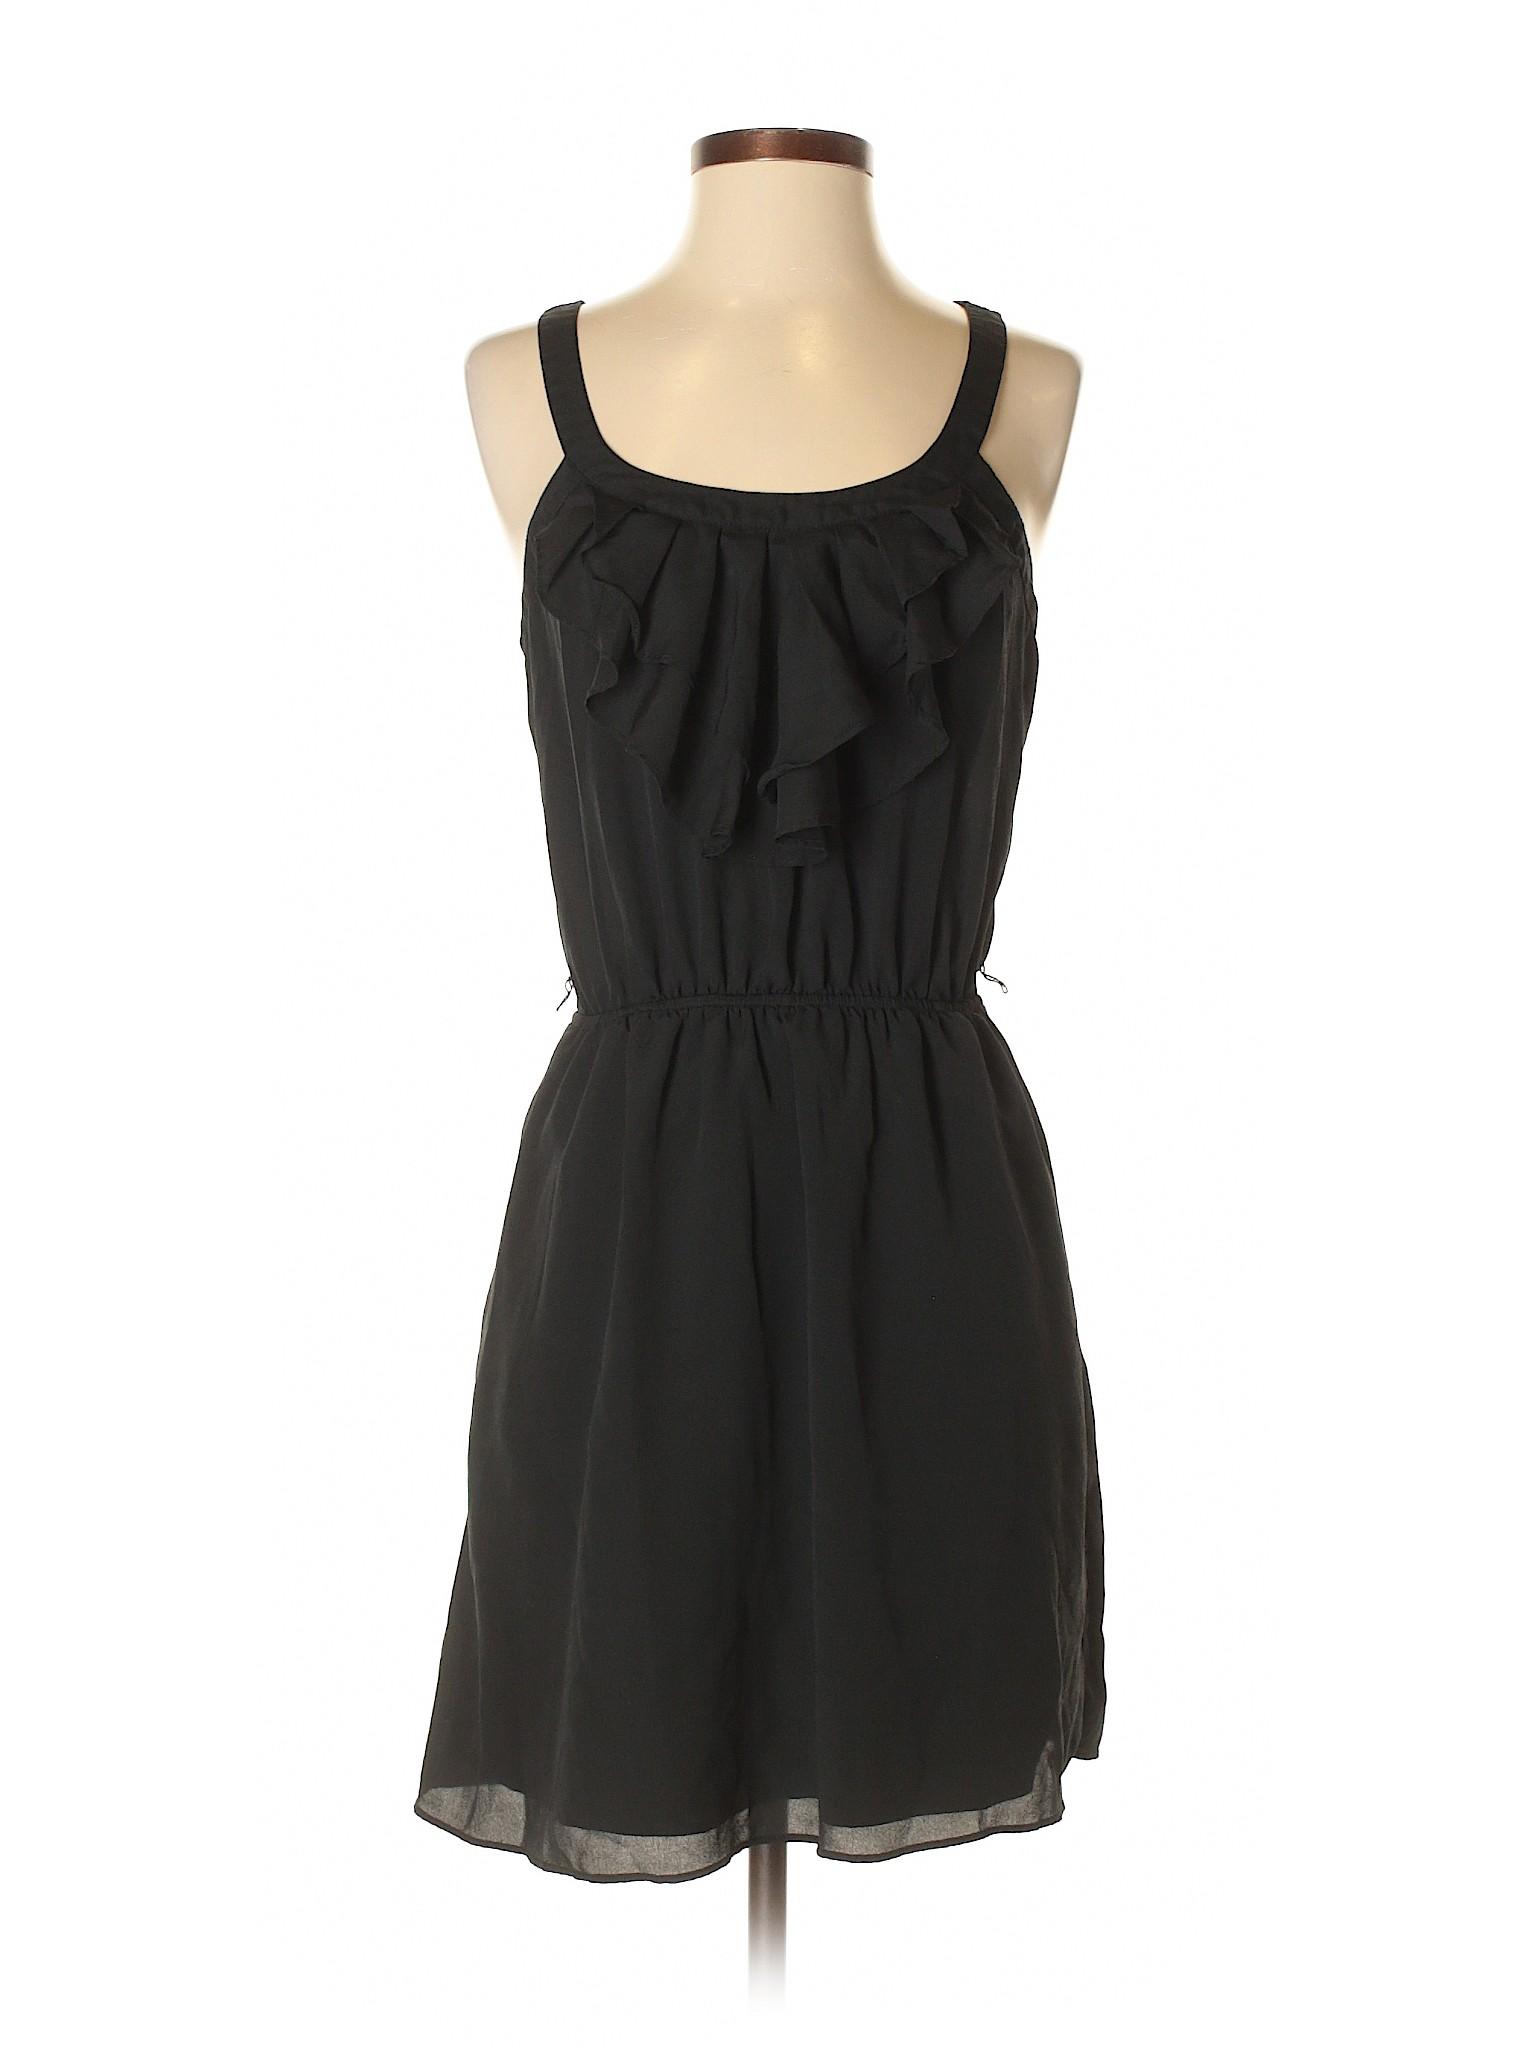 Casual Express Dress Express Casual Express Dress Casual Selling Selling Casual Selling Dress Dress Selling Selling Express fIq0wxdI